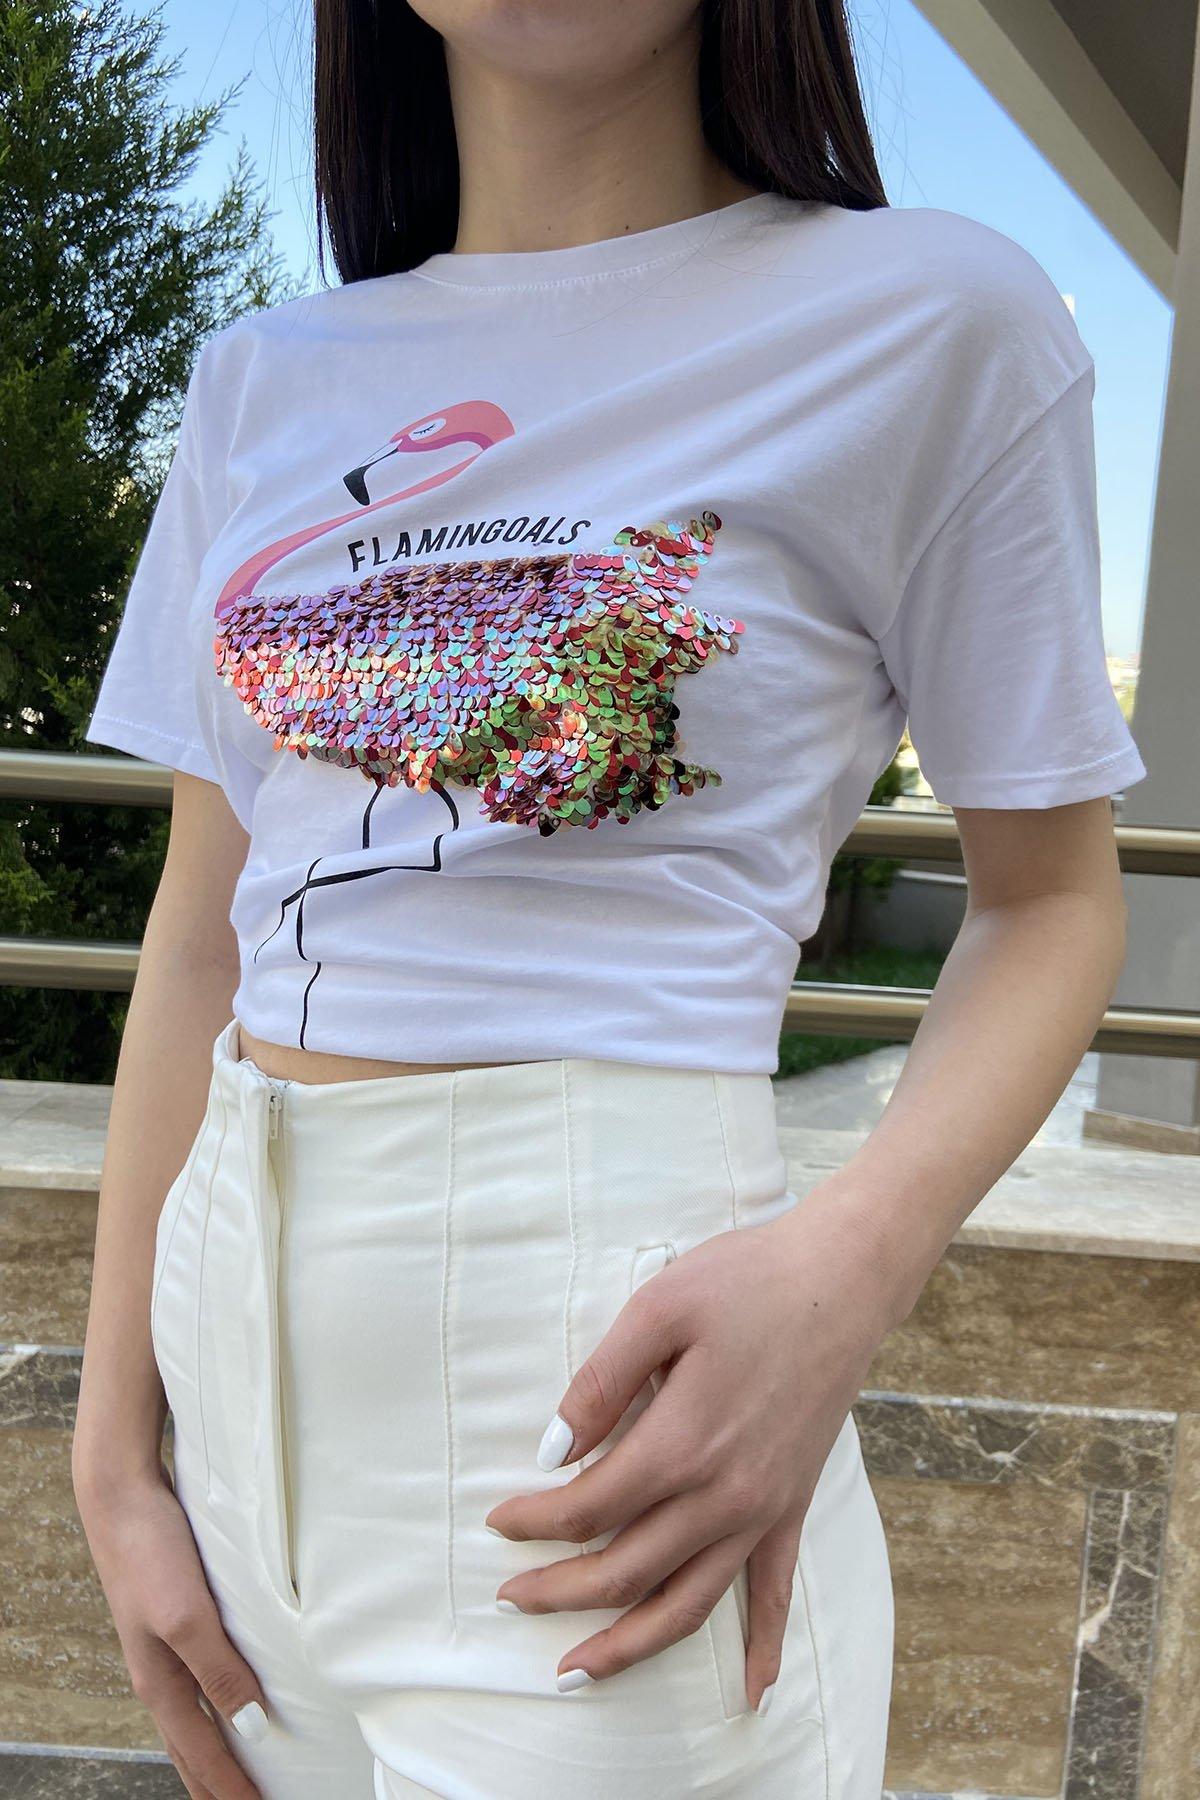 200 69t Flamingo Baskı Pullu Tshirt